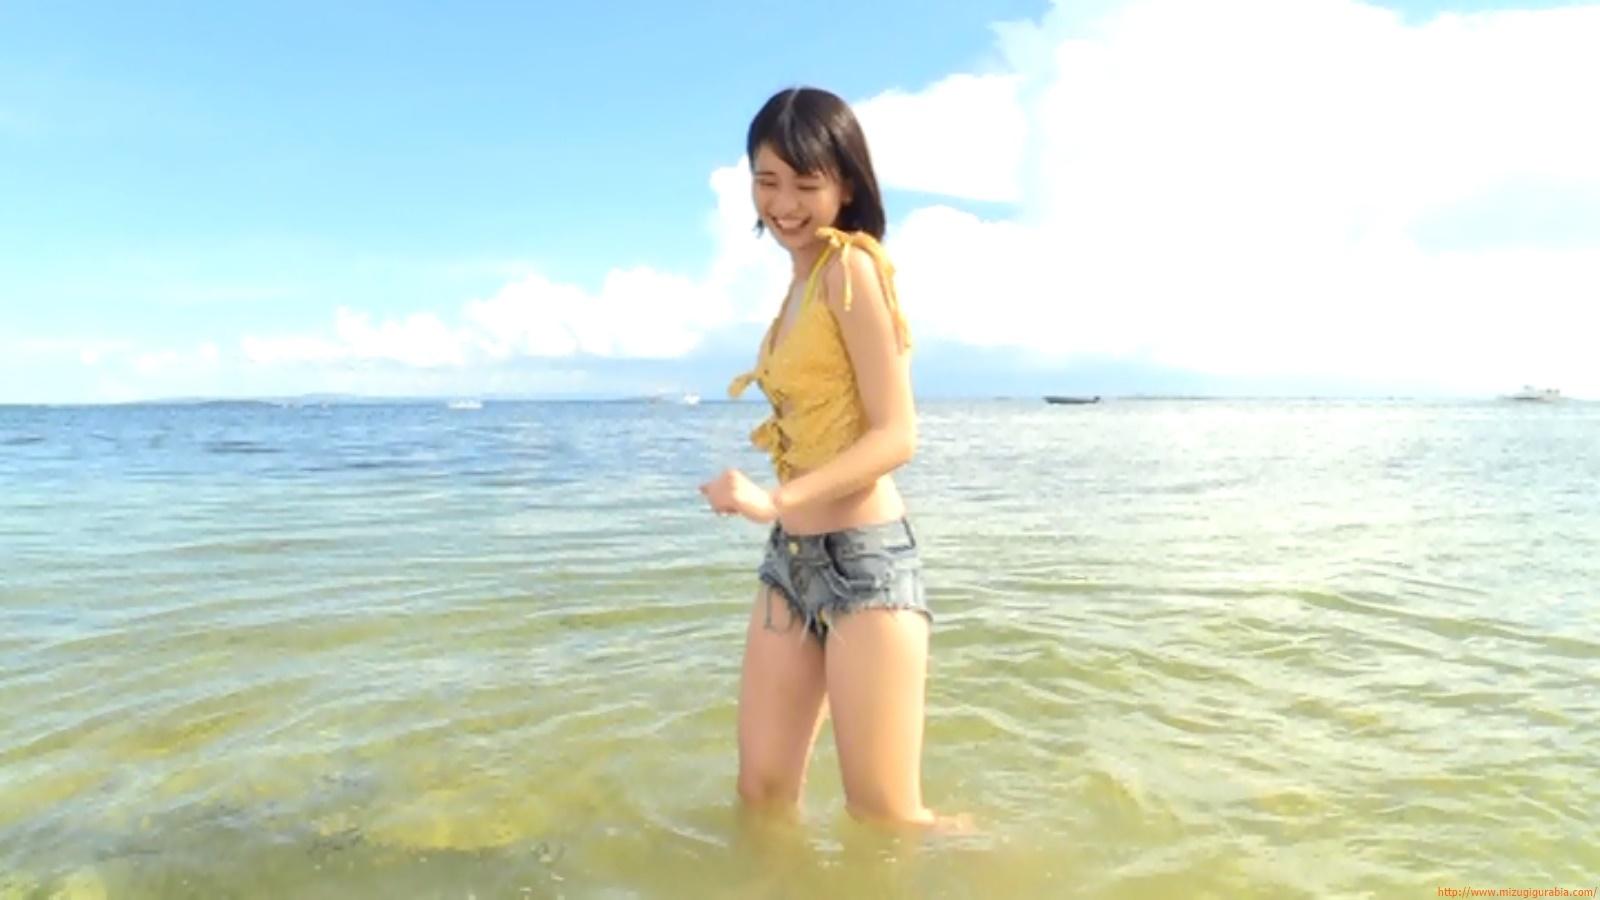 Beach dating093